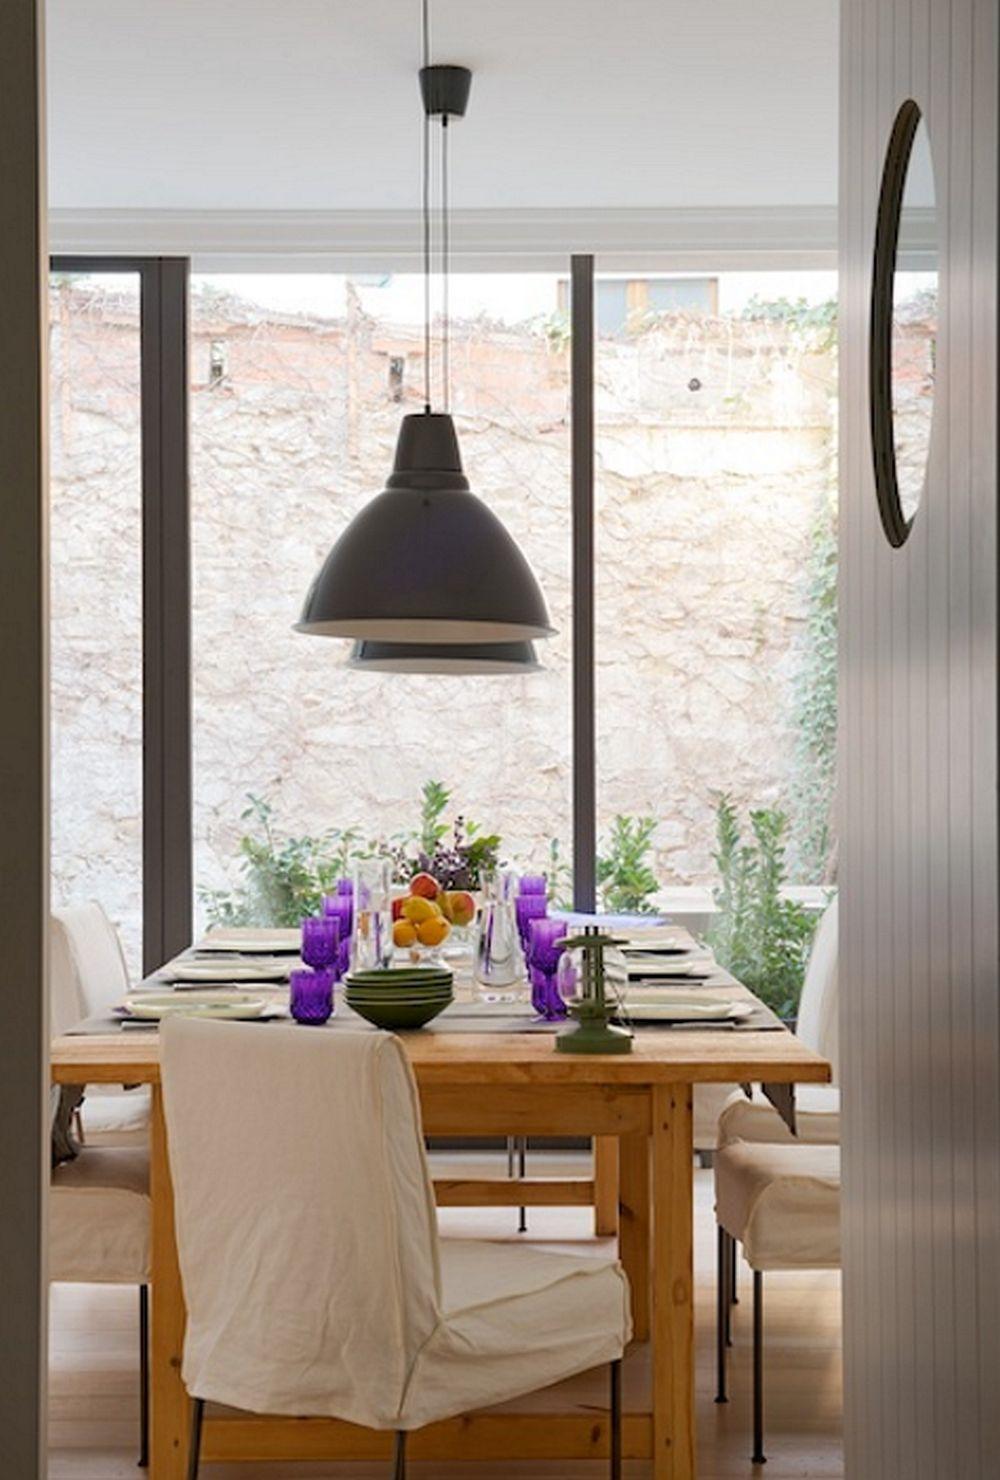 adelaparvu.com despre casa veche renovata, arhitect Albert Blanch, designer Gaby Conde, Foto ElMueble (7)